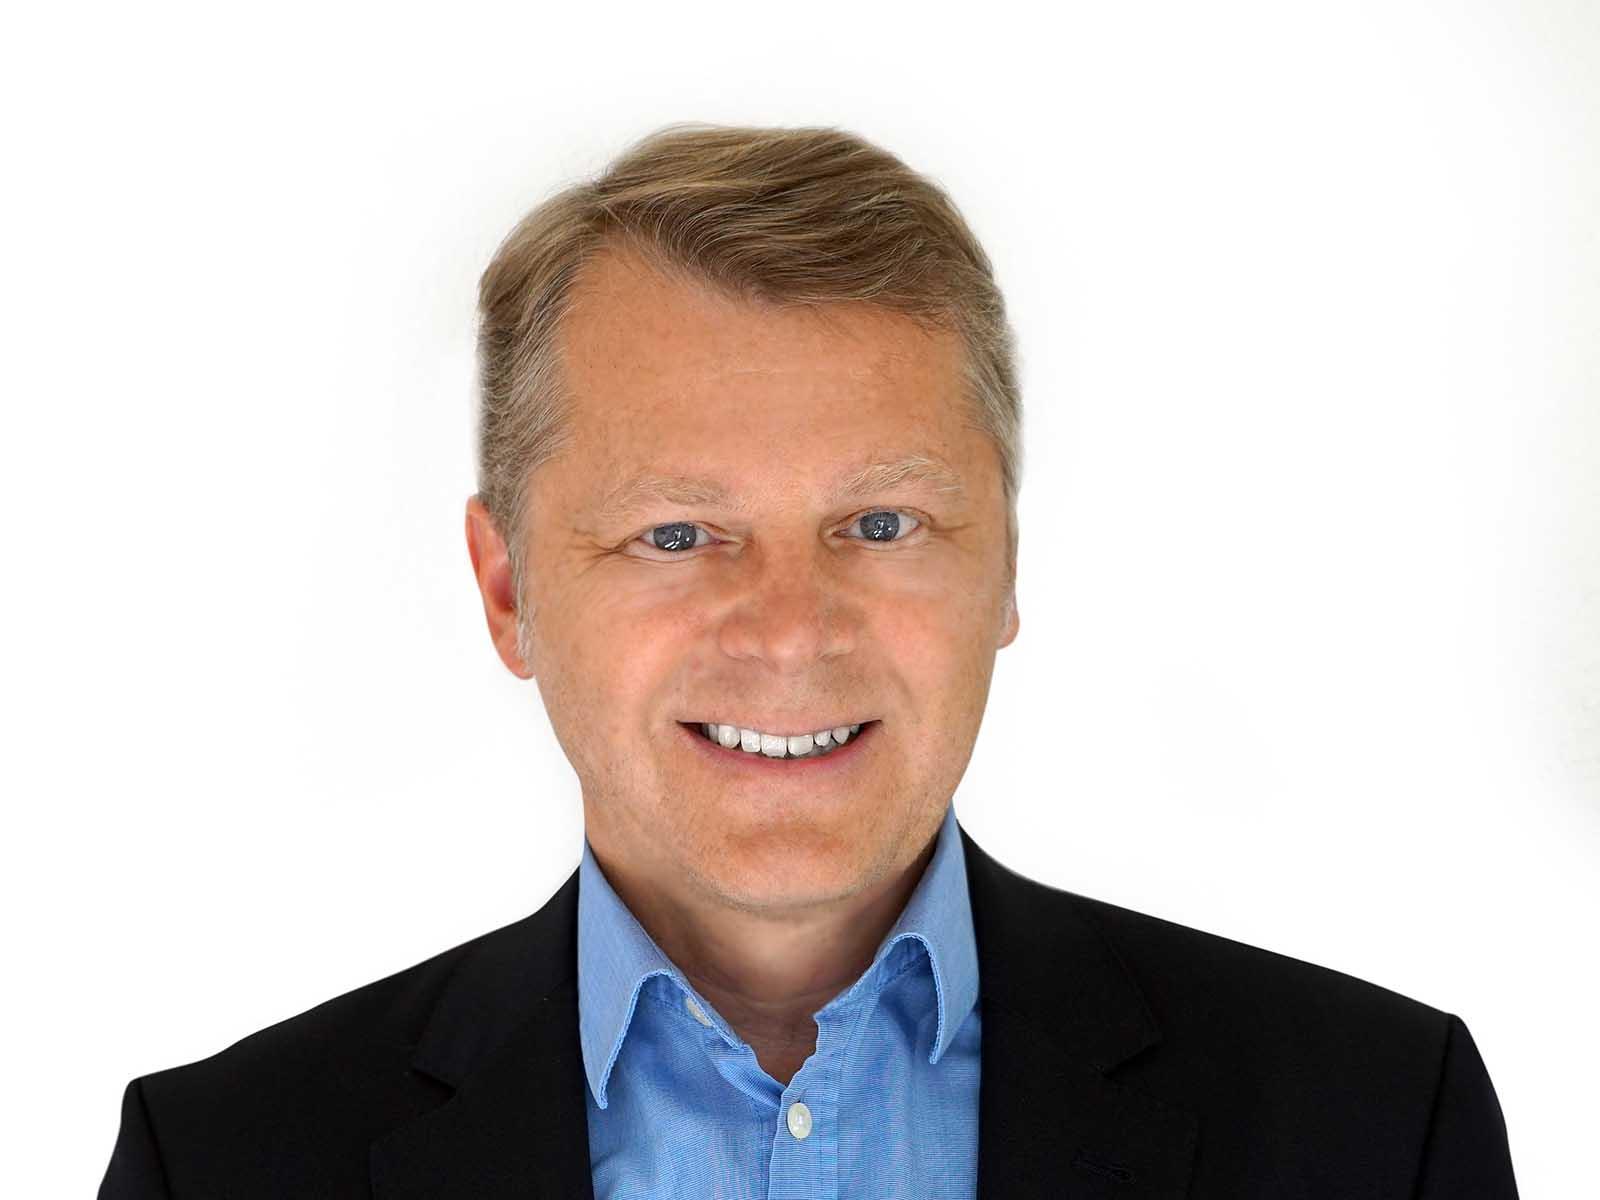 Robert Kouba, FDP